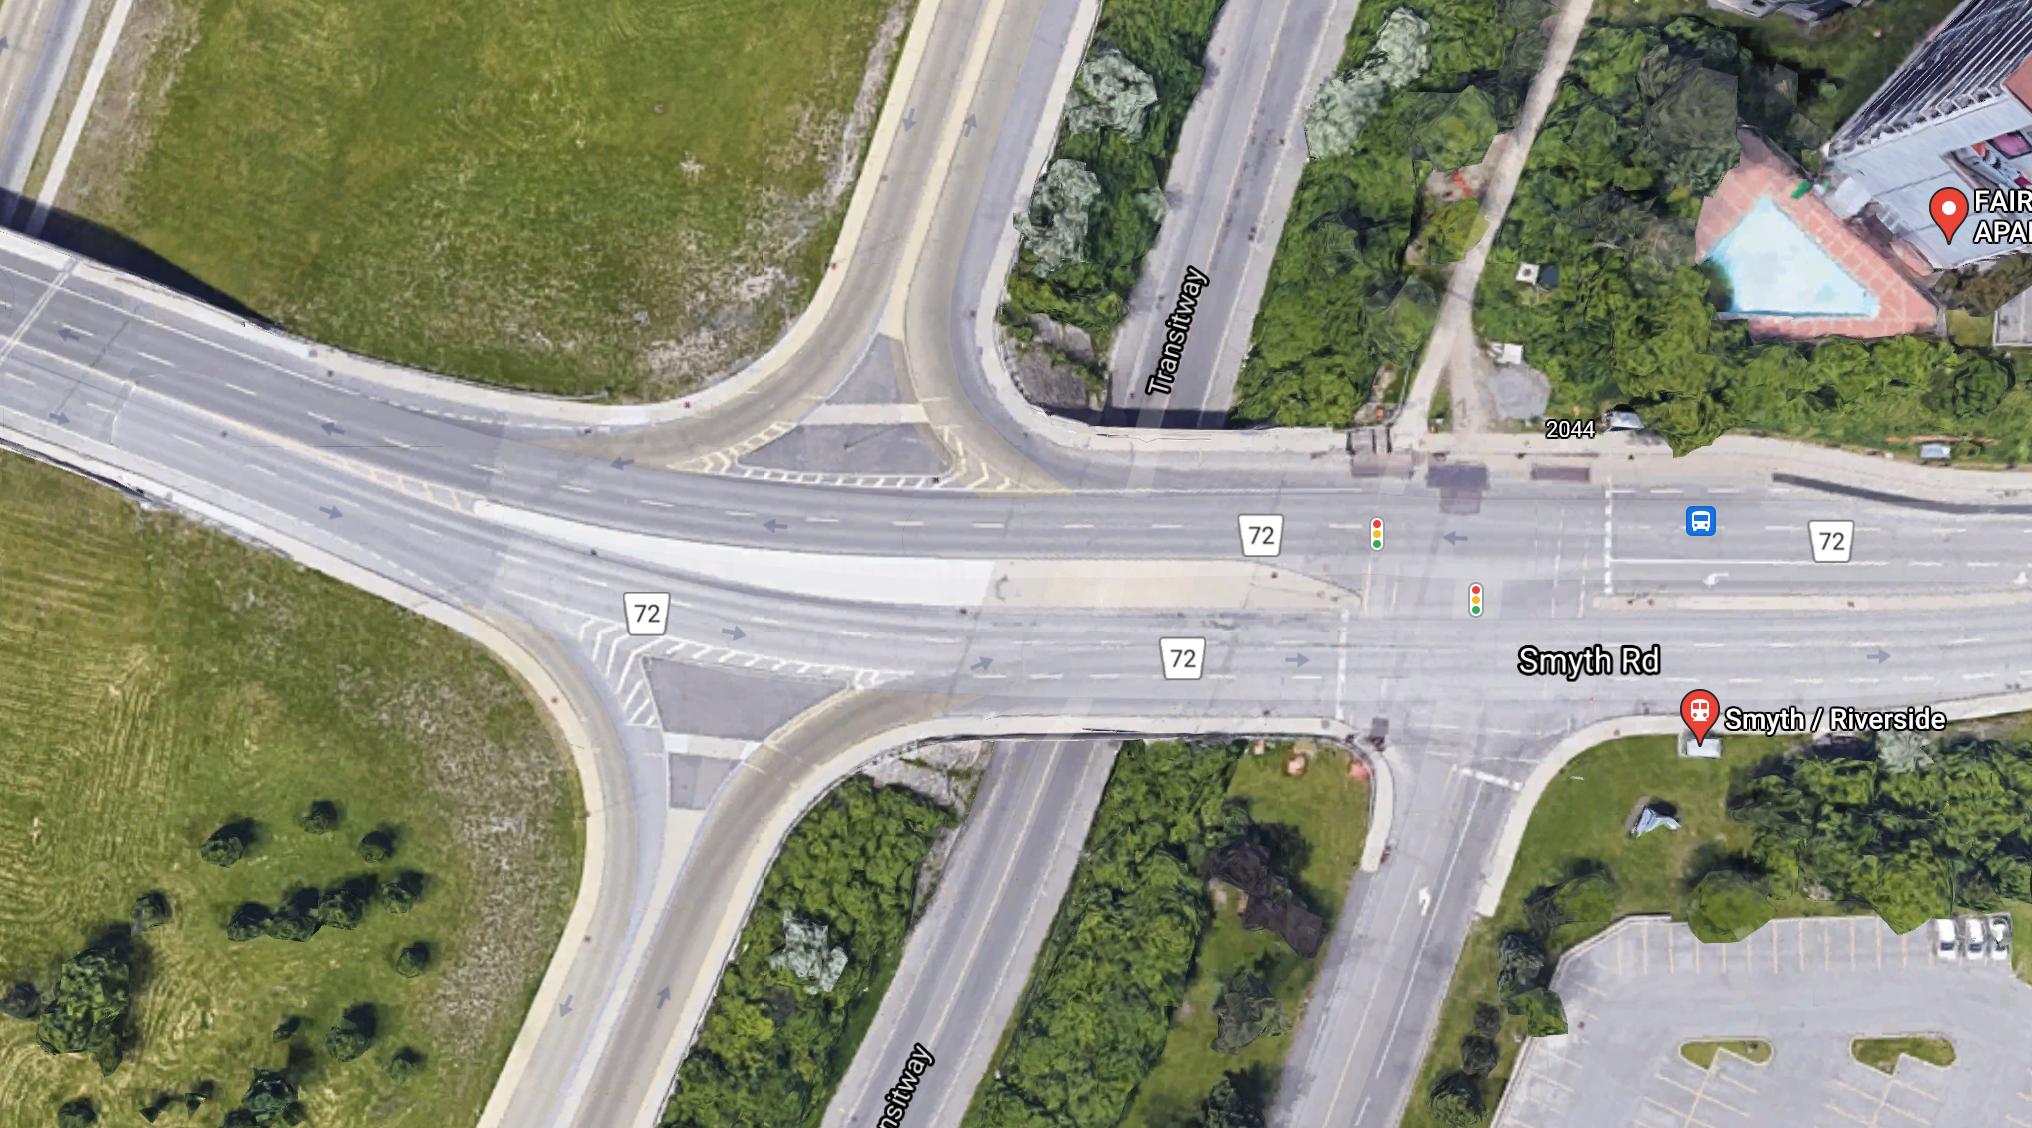 Google map screenshot of the satellite image of Smyth and Riverside